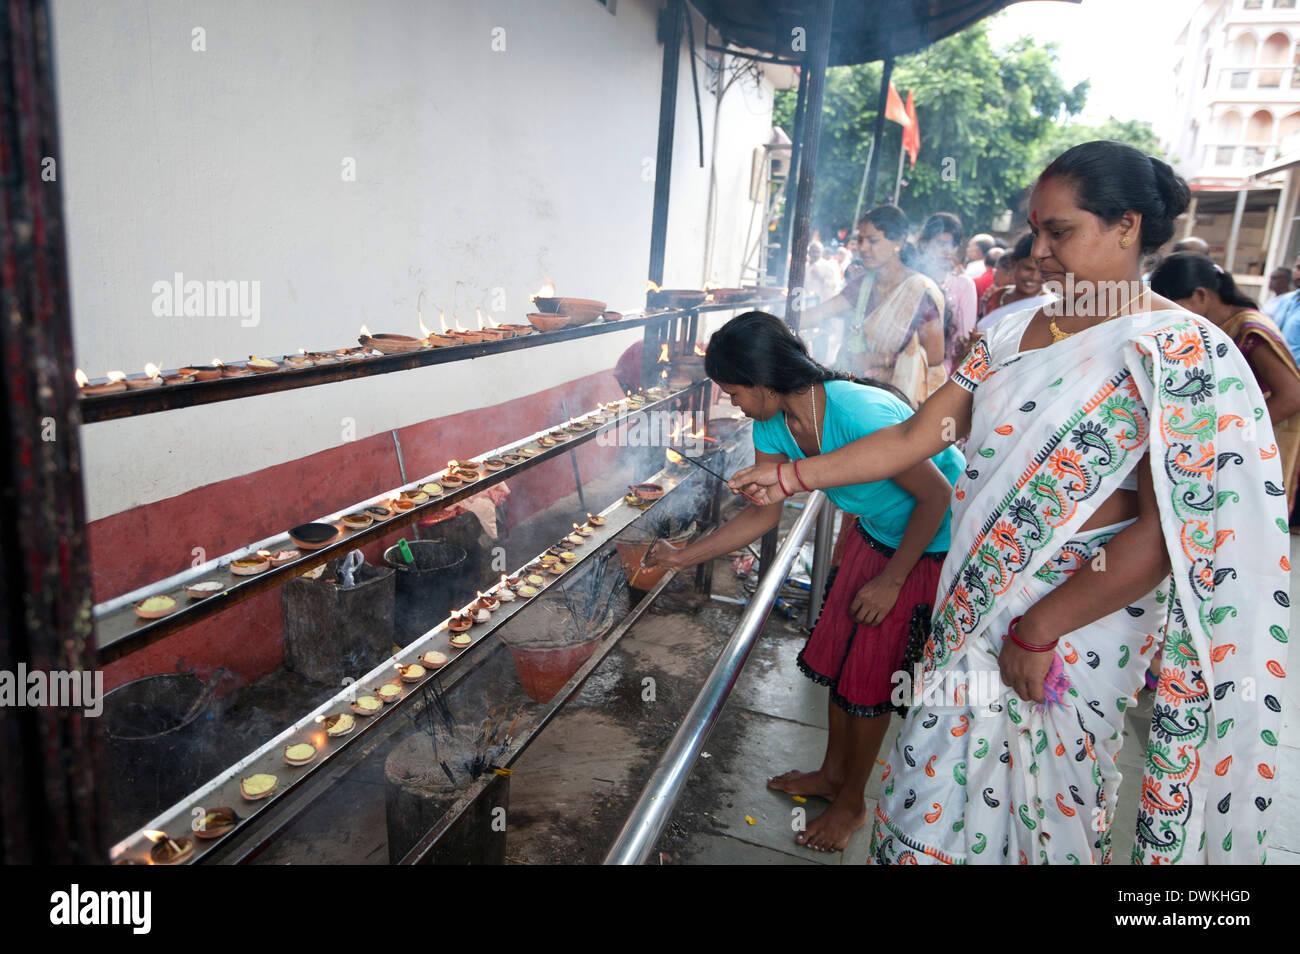 Donna indù in bianco sari eseguendo puja mediante illuminazione diya (candela) nel tempio Kamakhya, Guwahati, Assam, India, Asia Immagini Stock